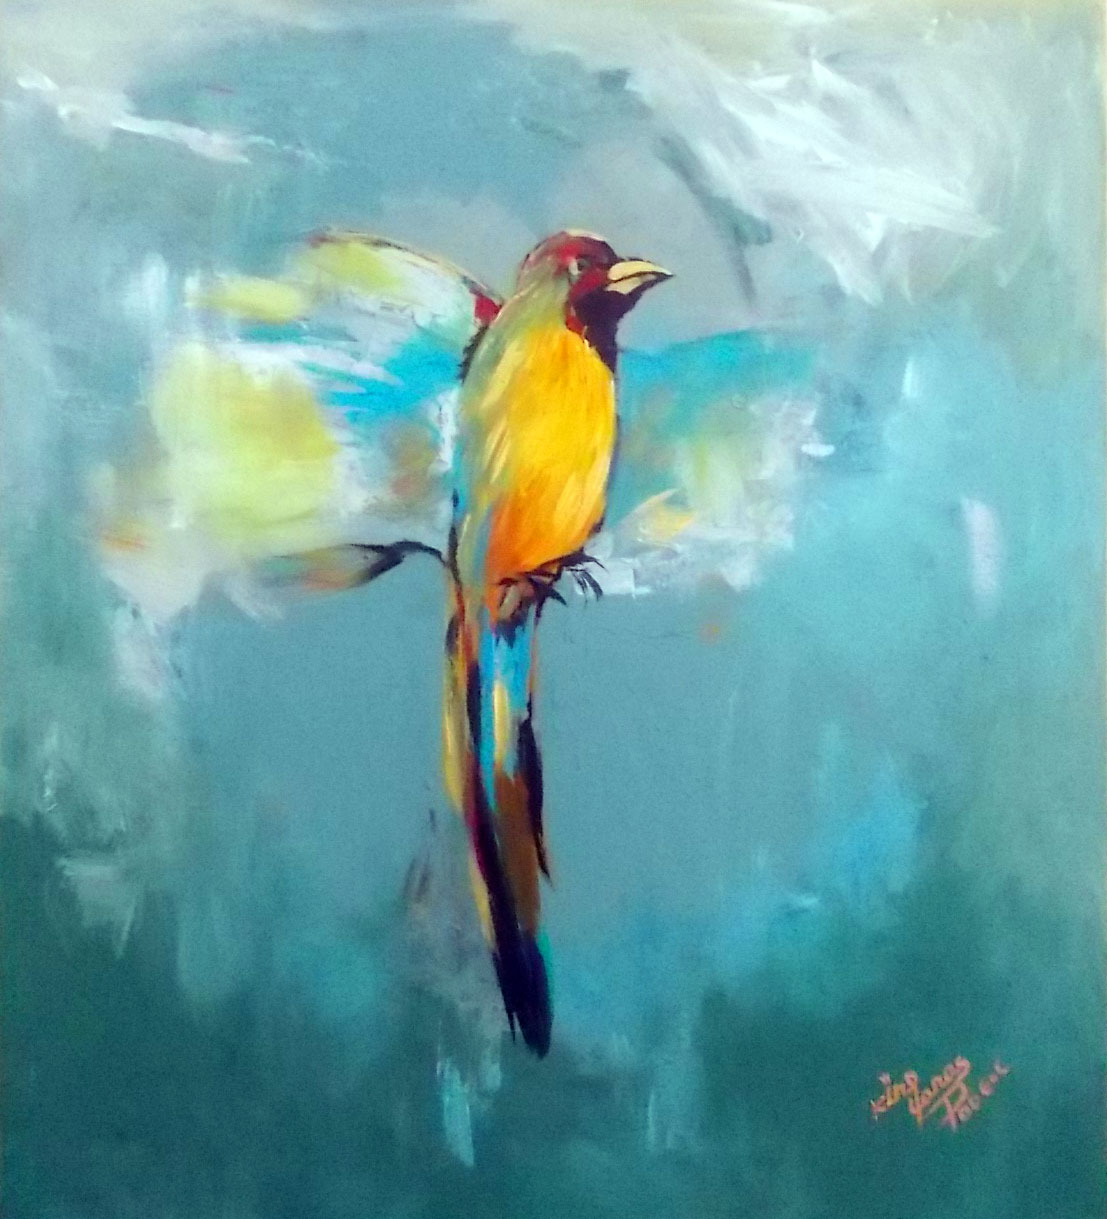 Bird of Hawassa  artwork by Yonas Degefa - art listed for sale on Artplode